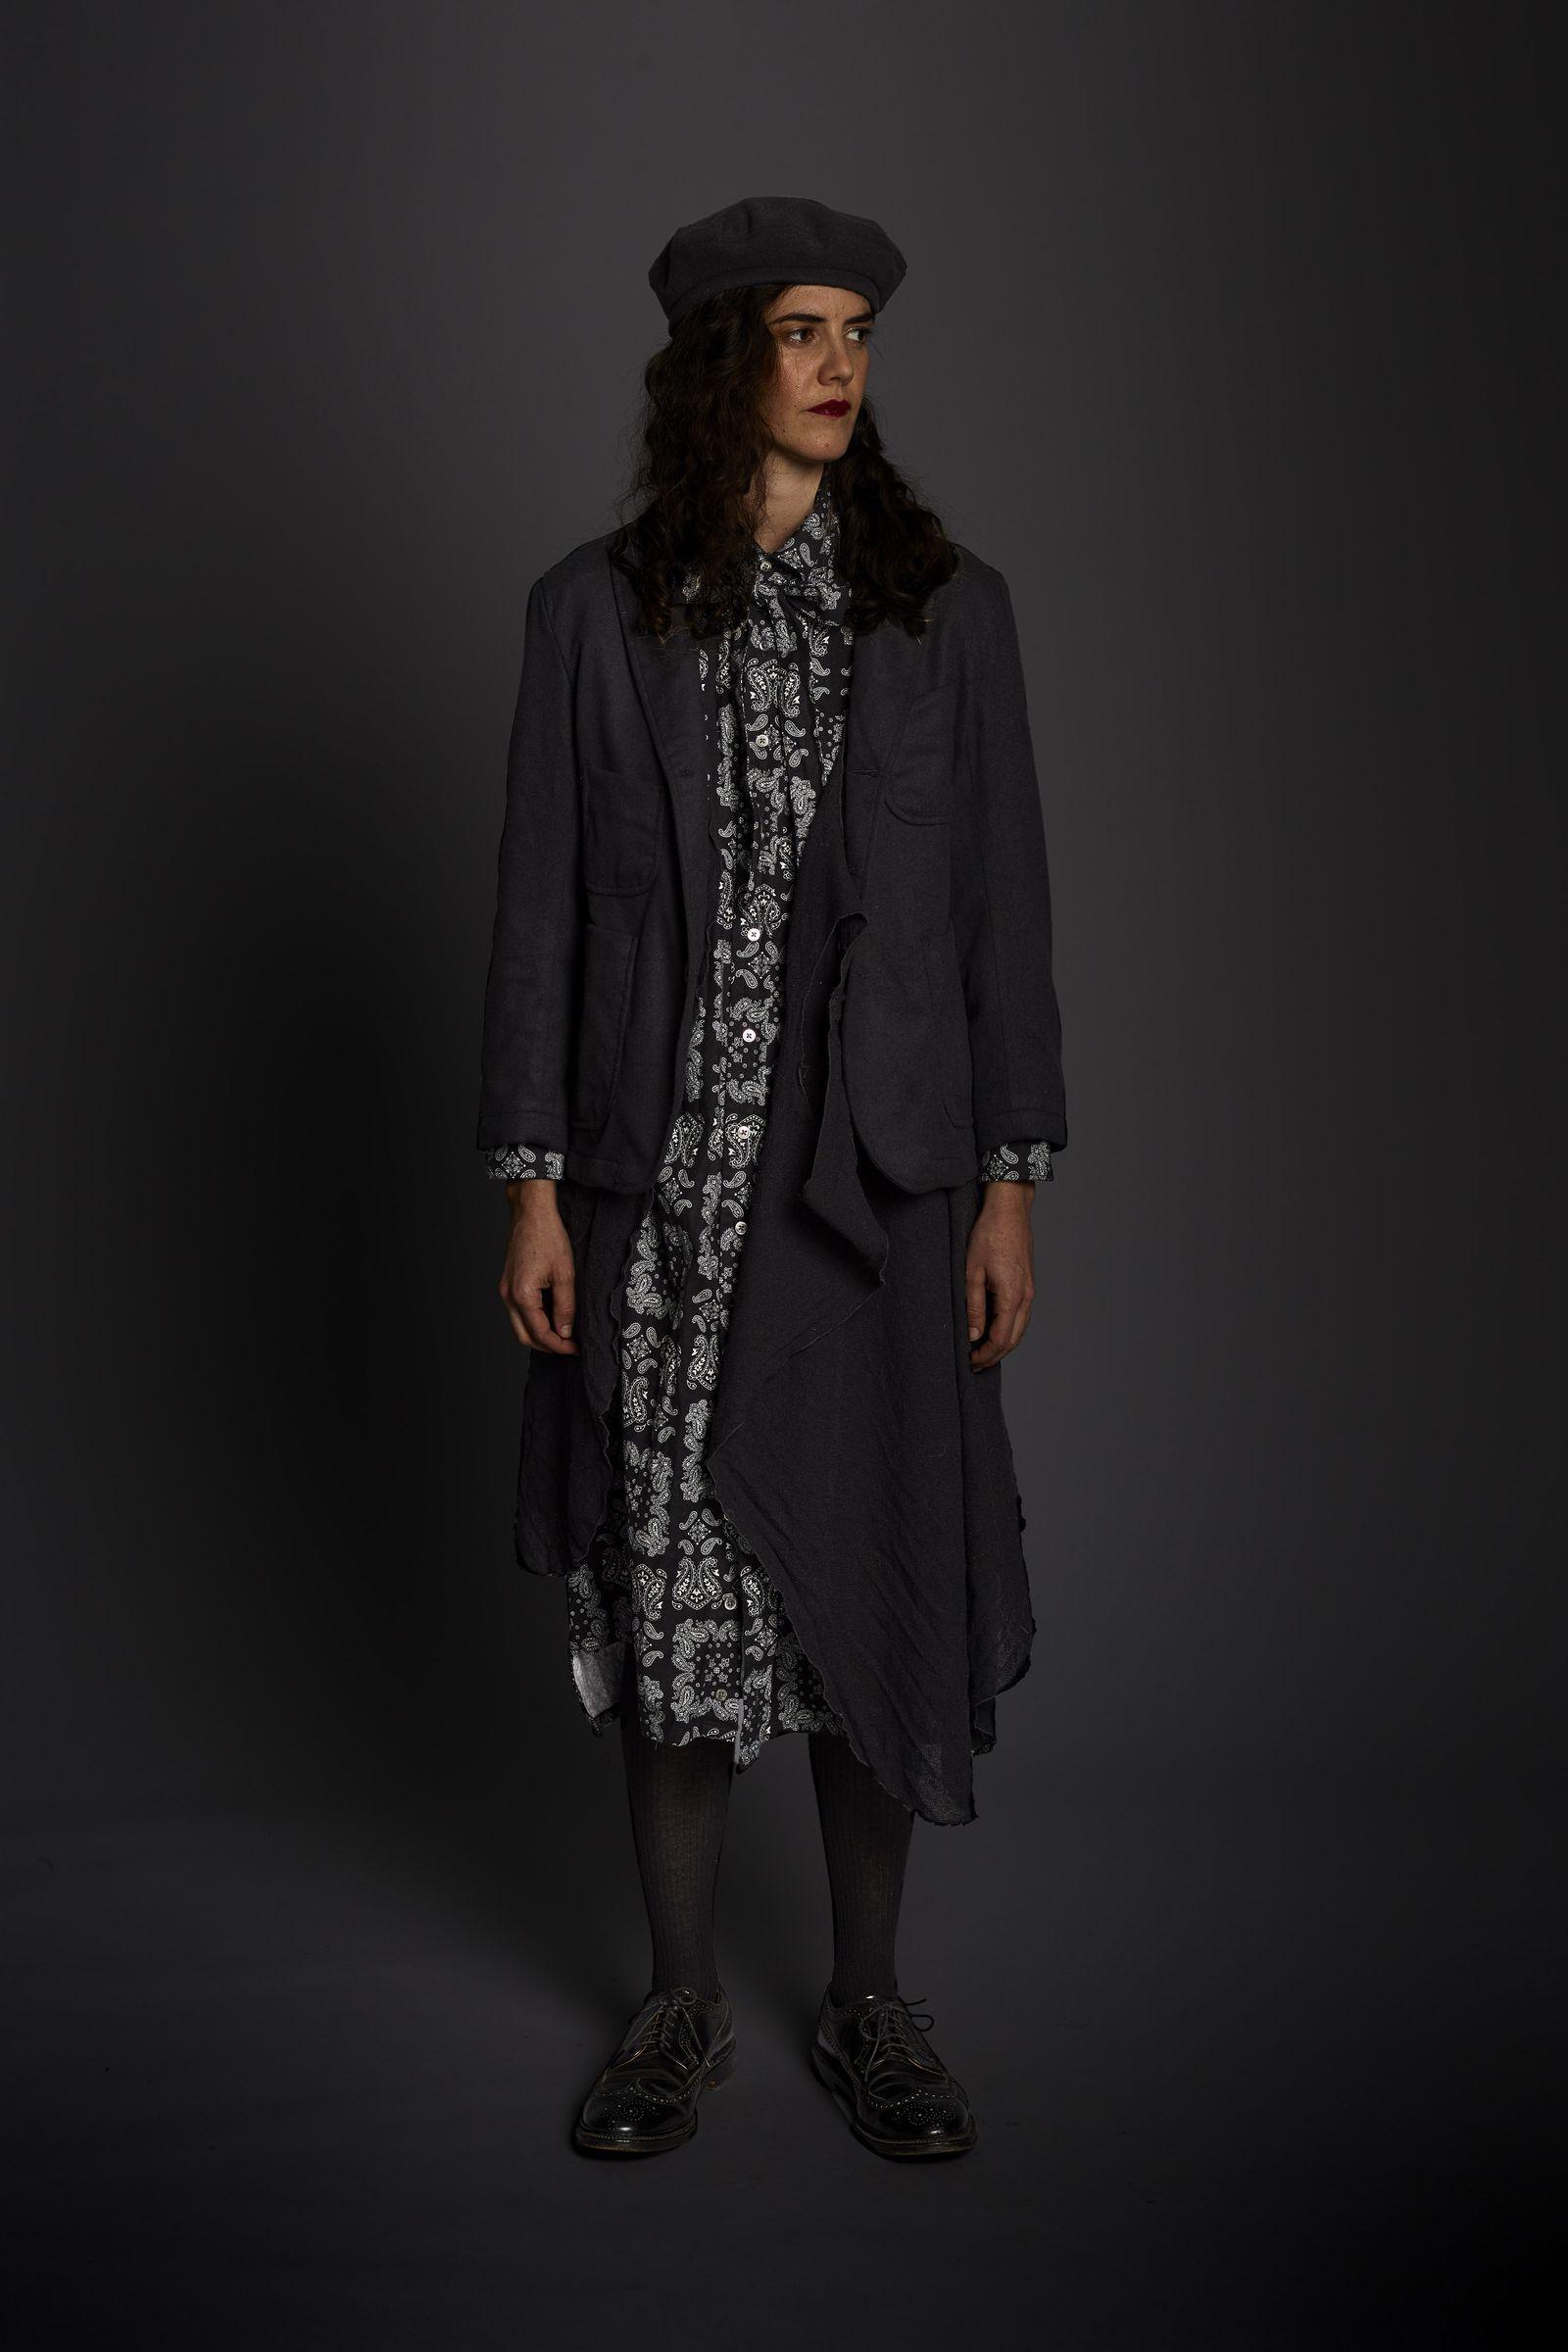 engineered-garments-fall-winter-2020-33